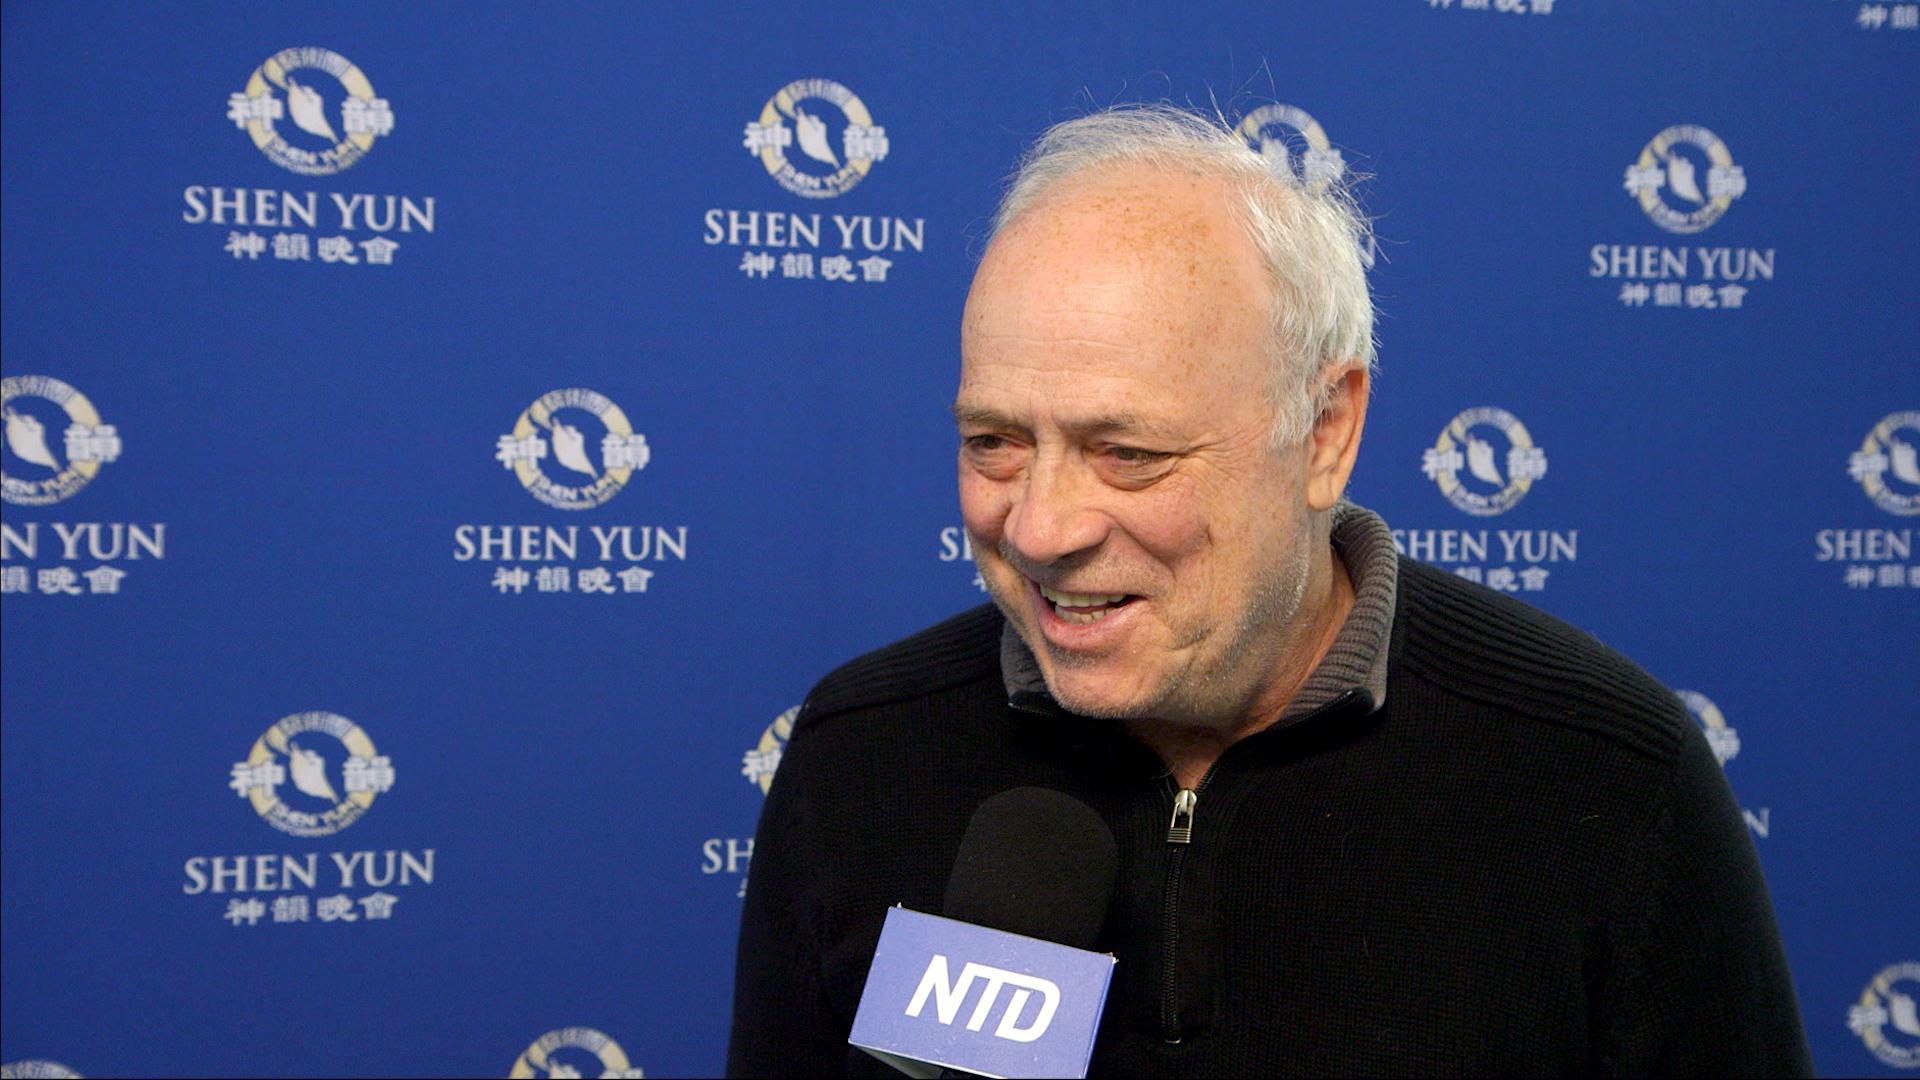 Shen Yun Music 'Evocative and Spiritual,' Says Veteran Artistic Director